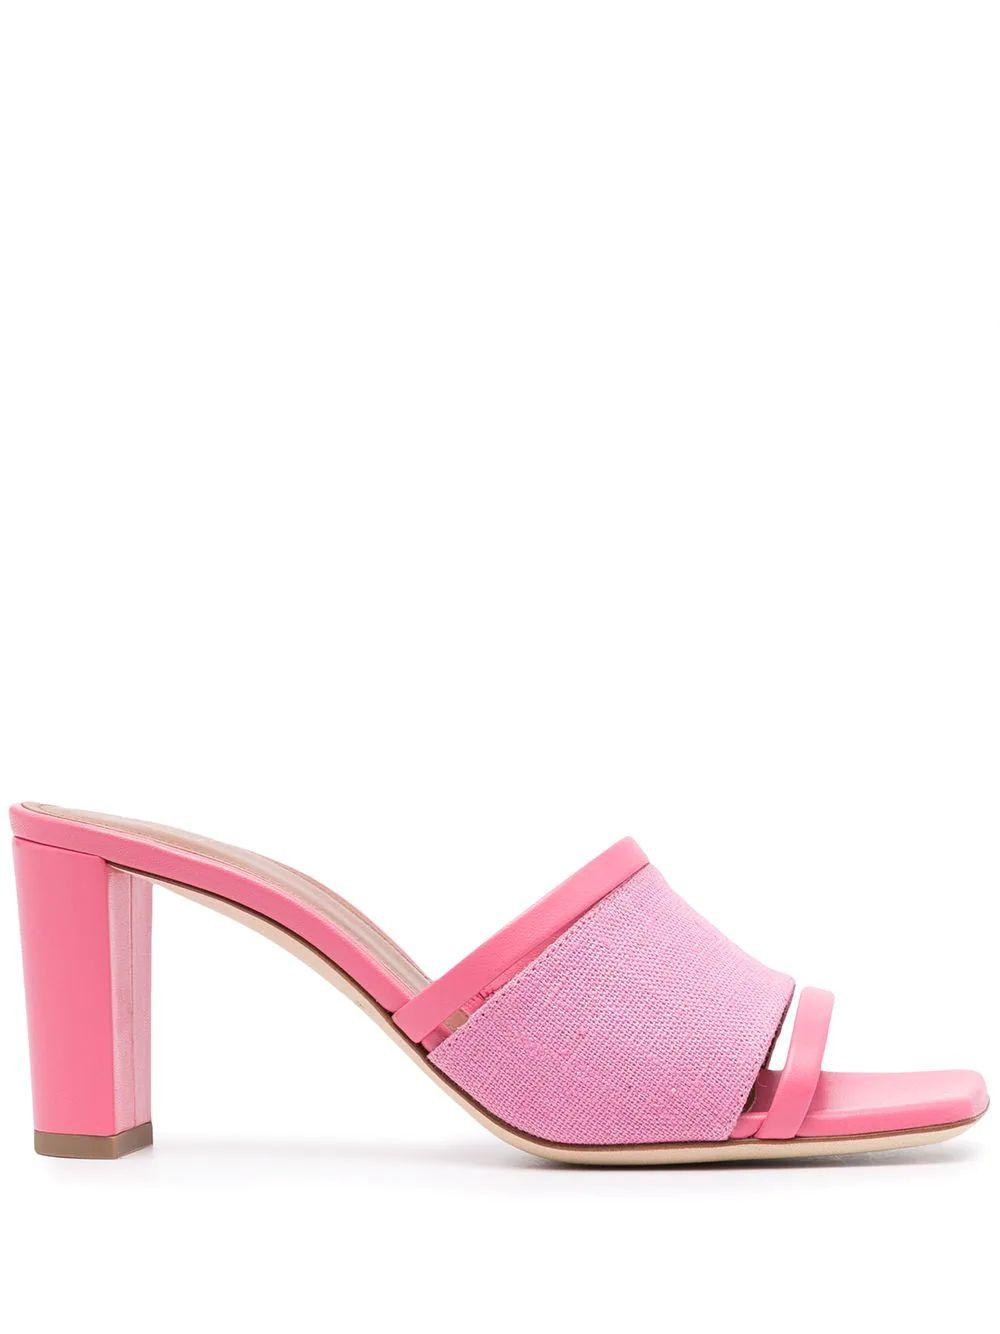 Demi Mule Sandal Item # DEMI70-31